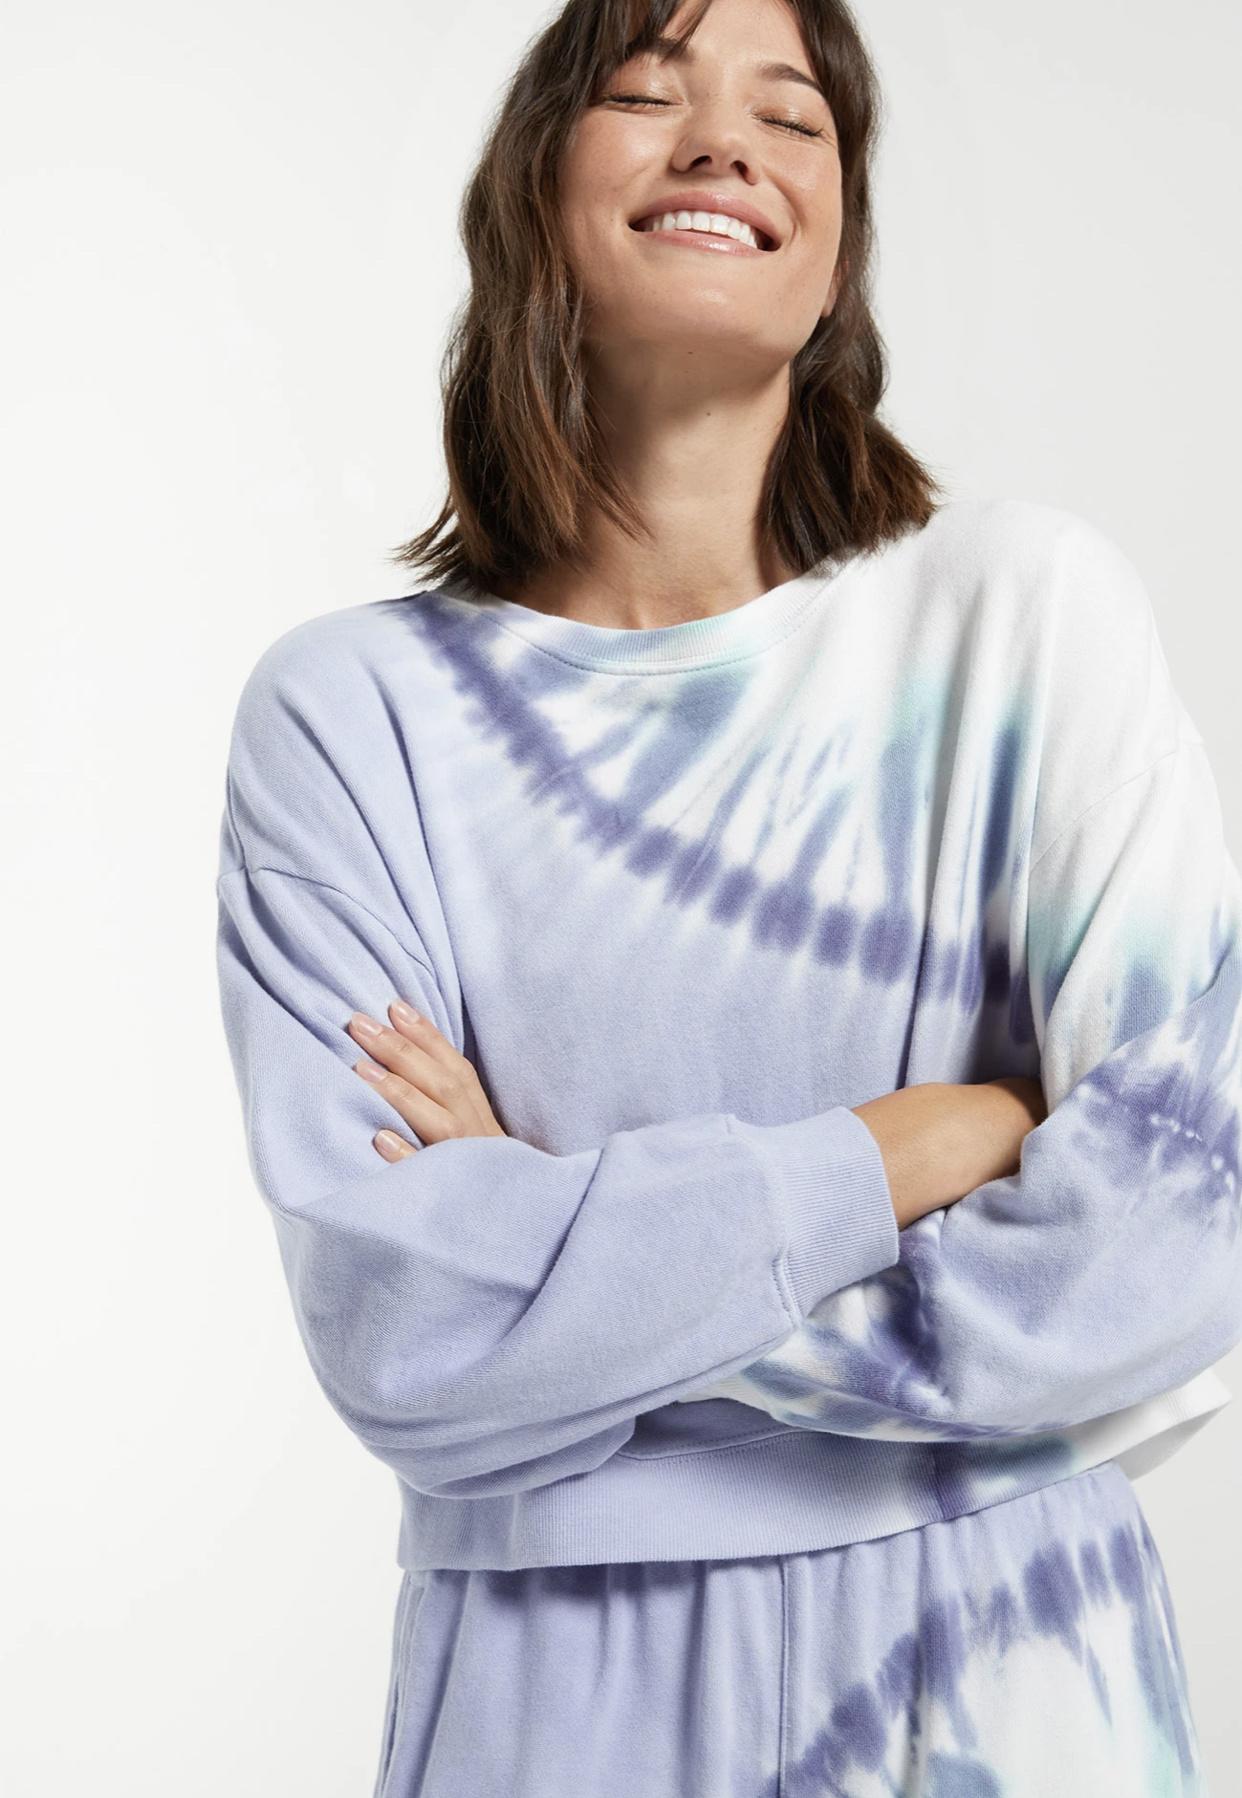 Z Supply Sunburst Tie Dye Set - Ice Blue